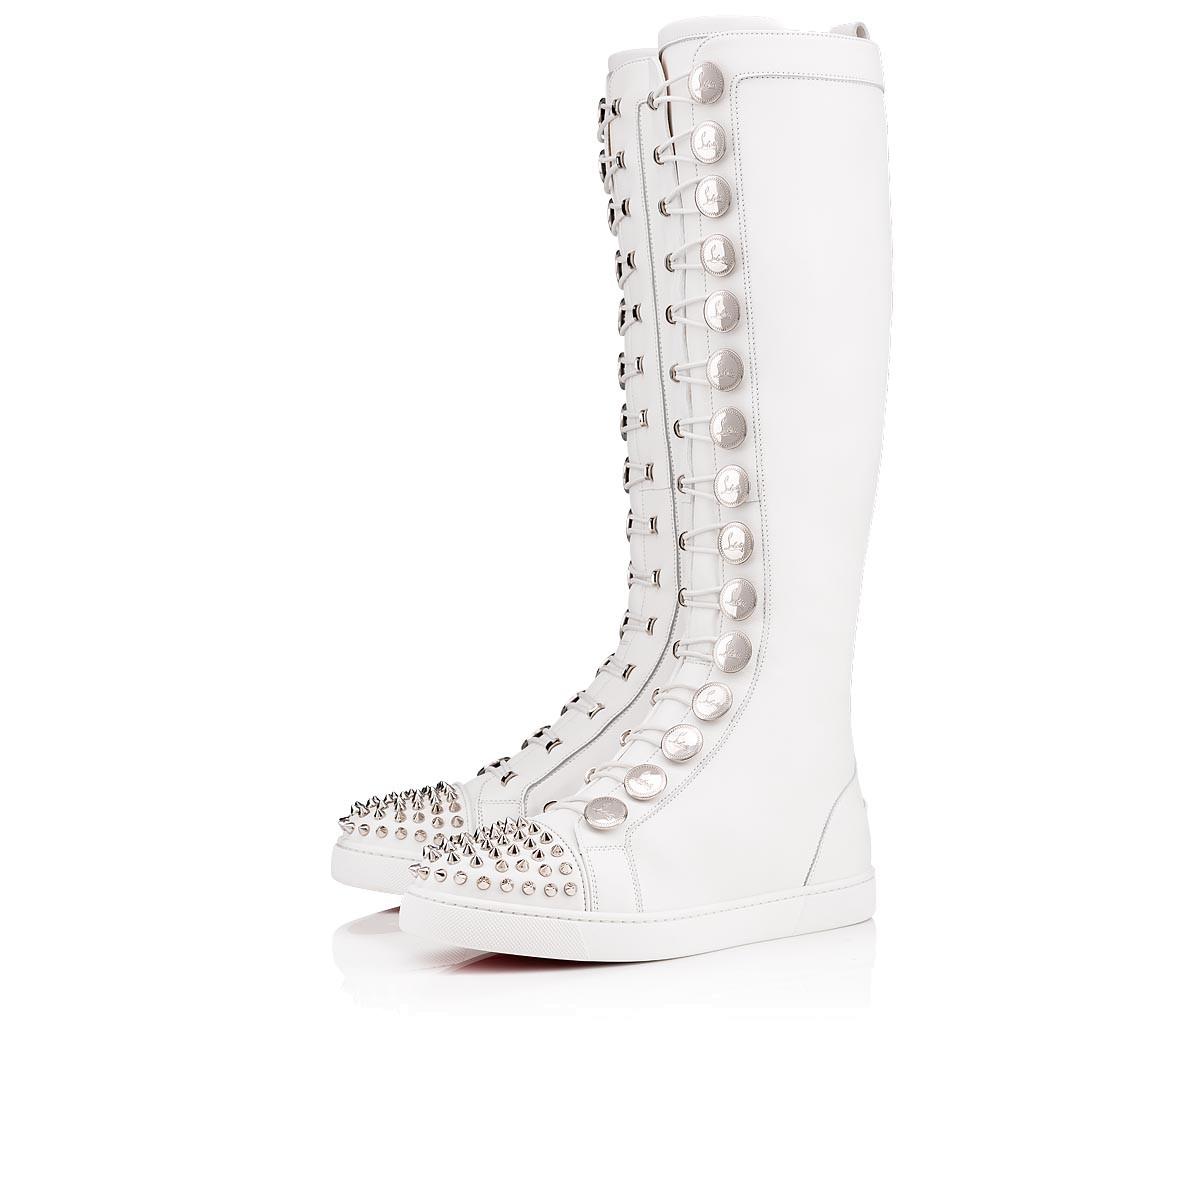 Sneakers a stivali Christian Louboutin a 1,995 euro